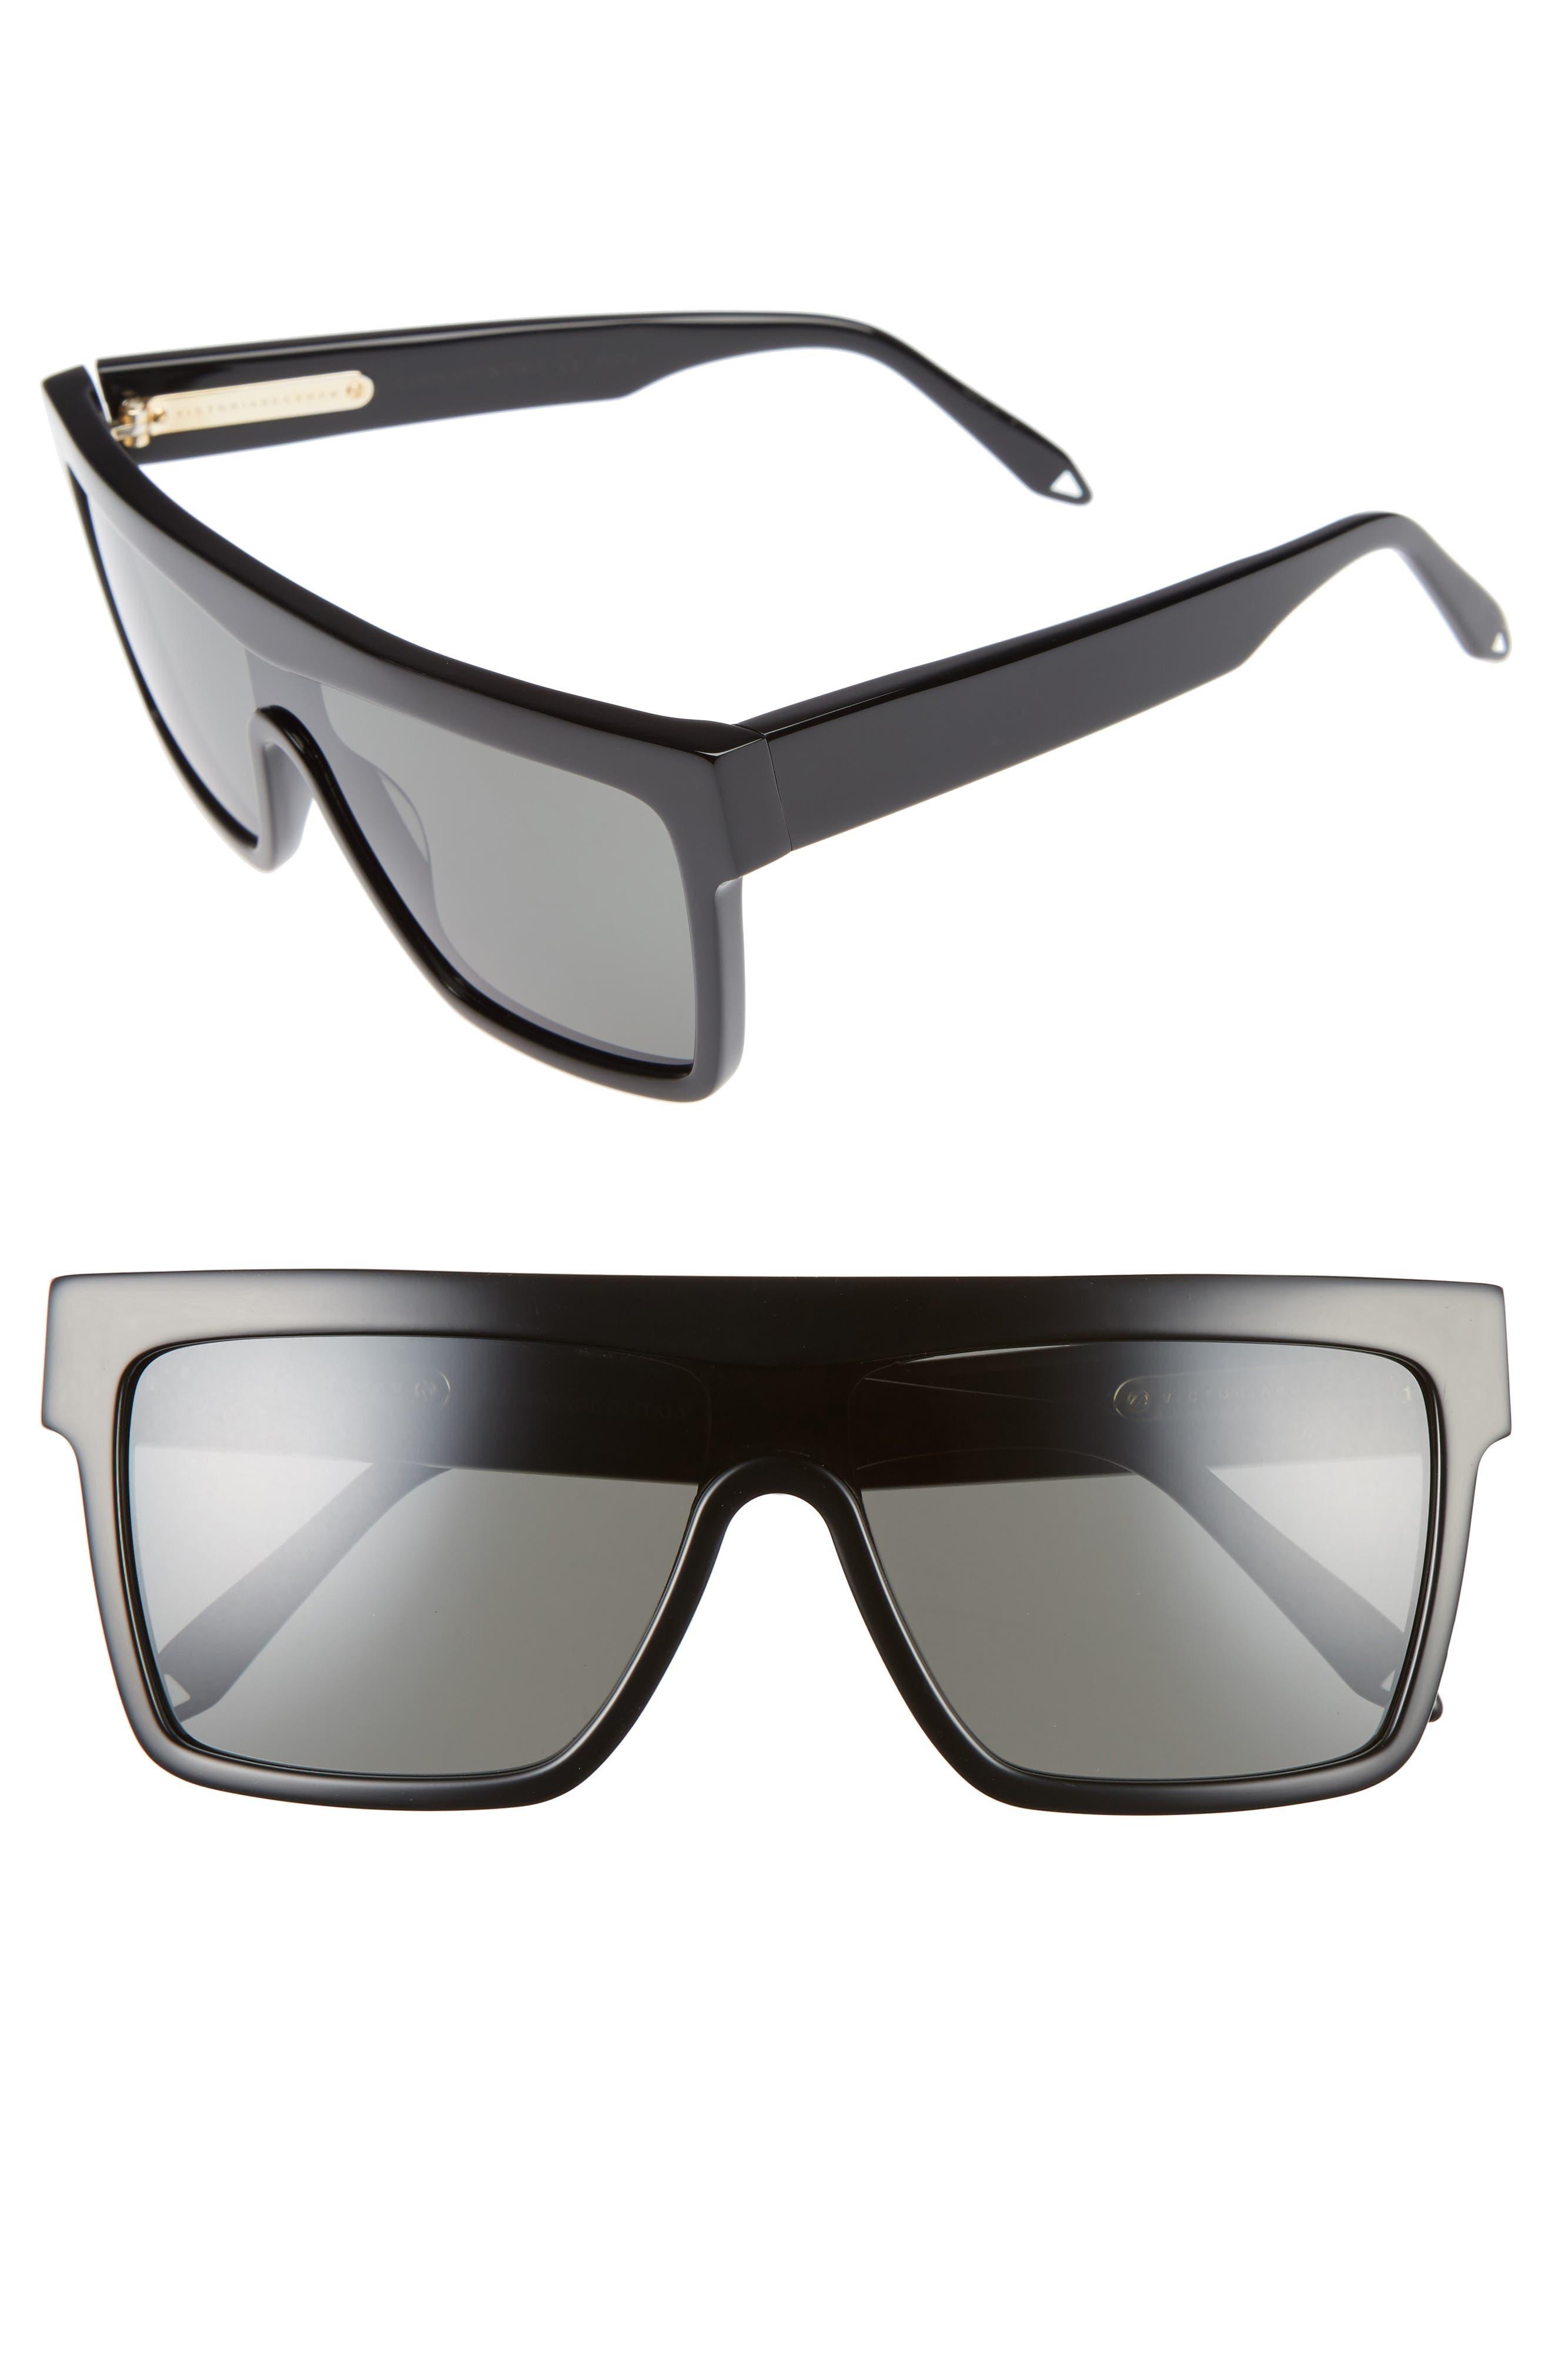 Main Image - Victoria Beckham 57mm Flat Top Sunglasses